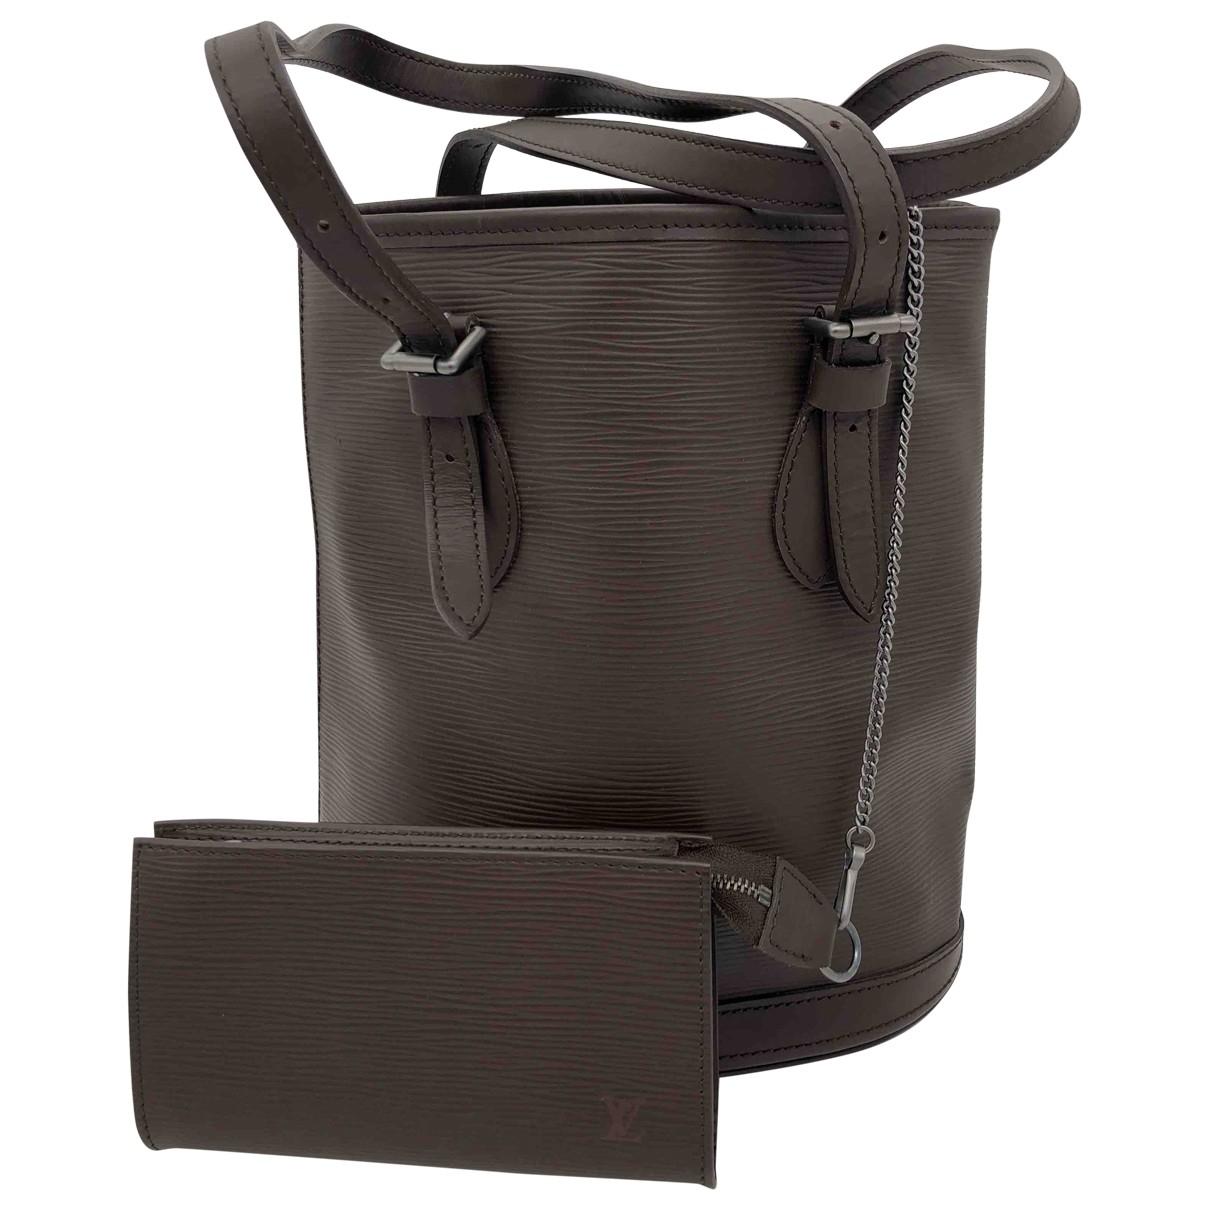 Louis Vuitton - Sac a main Bucket  pour femme en cuir - marron